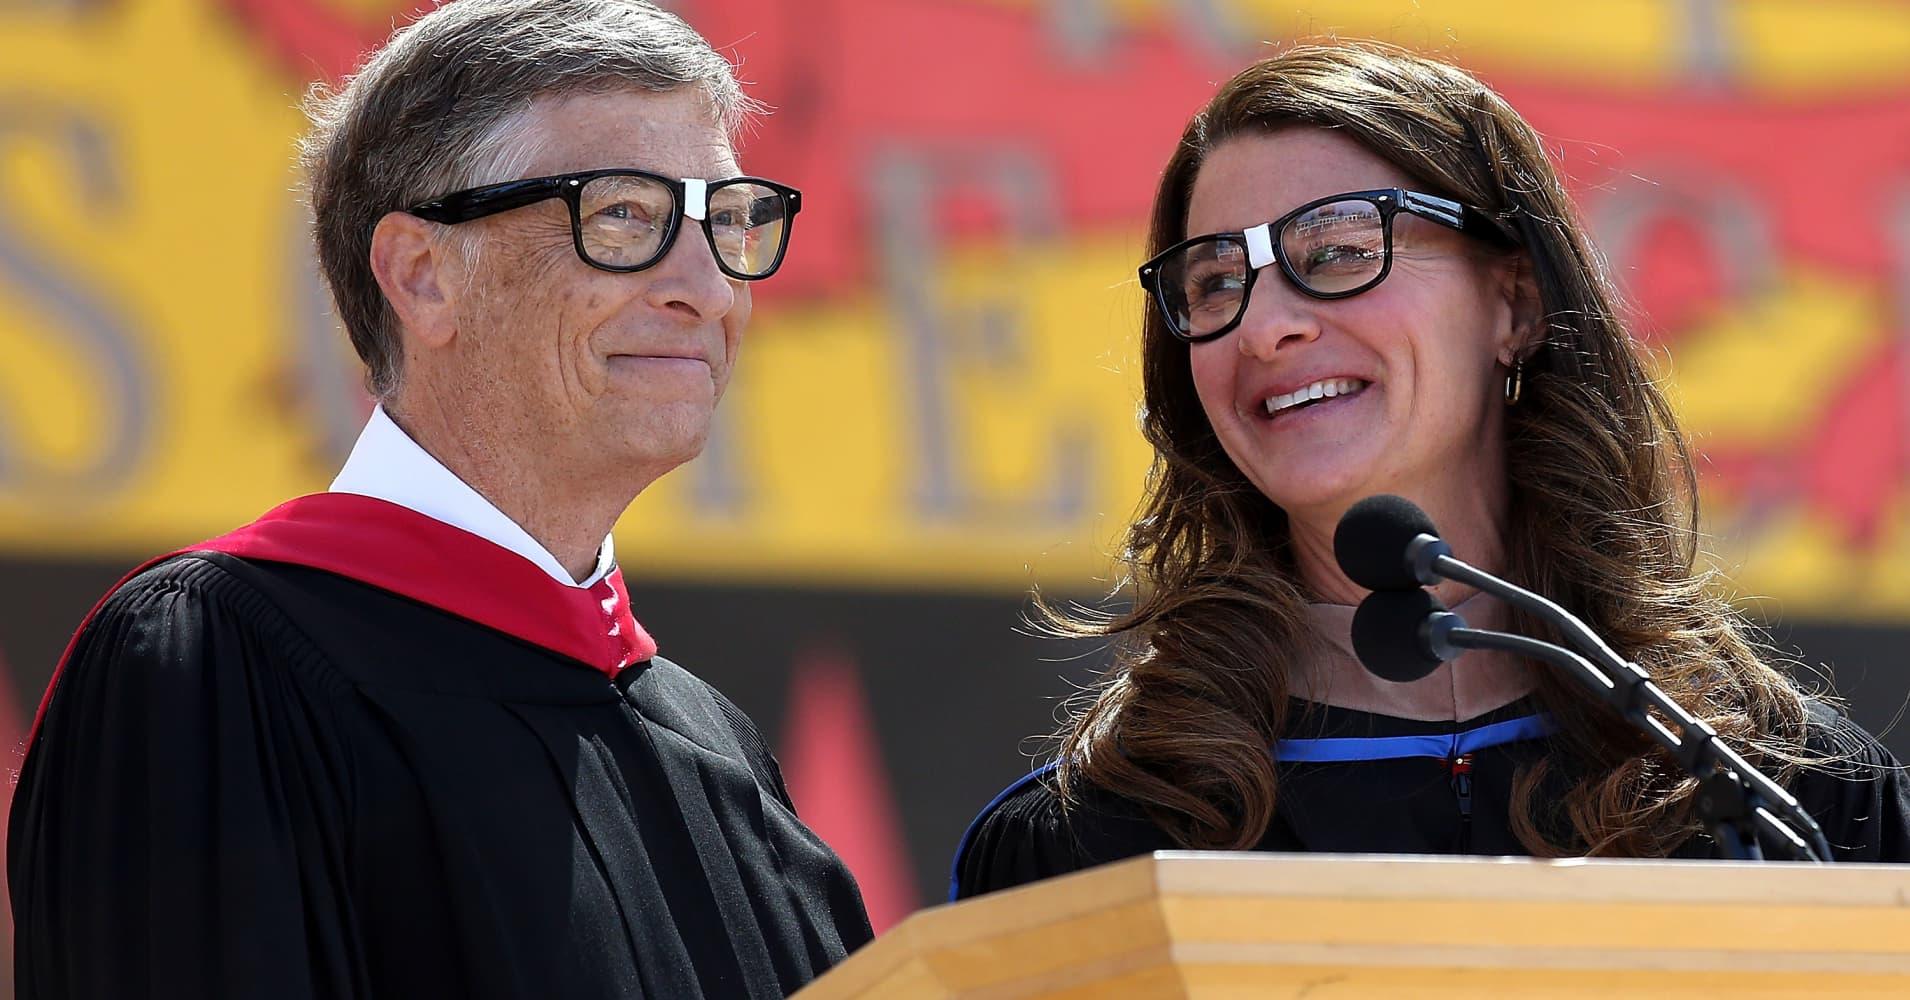 Bill and Melinda Gates are avid readers